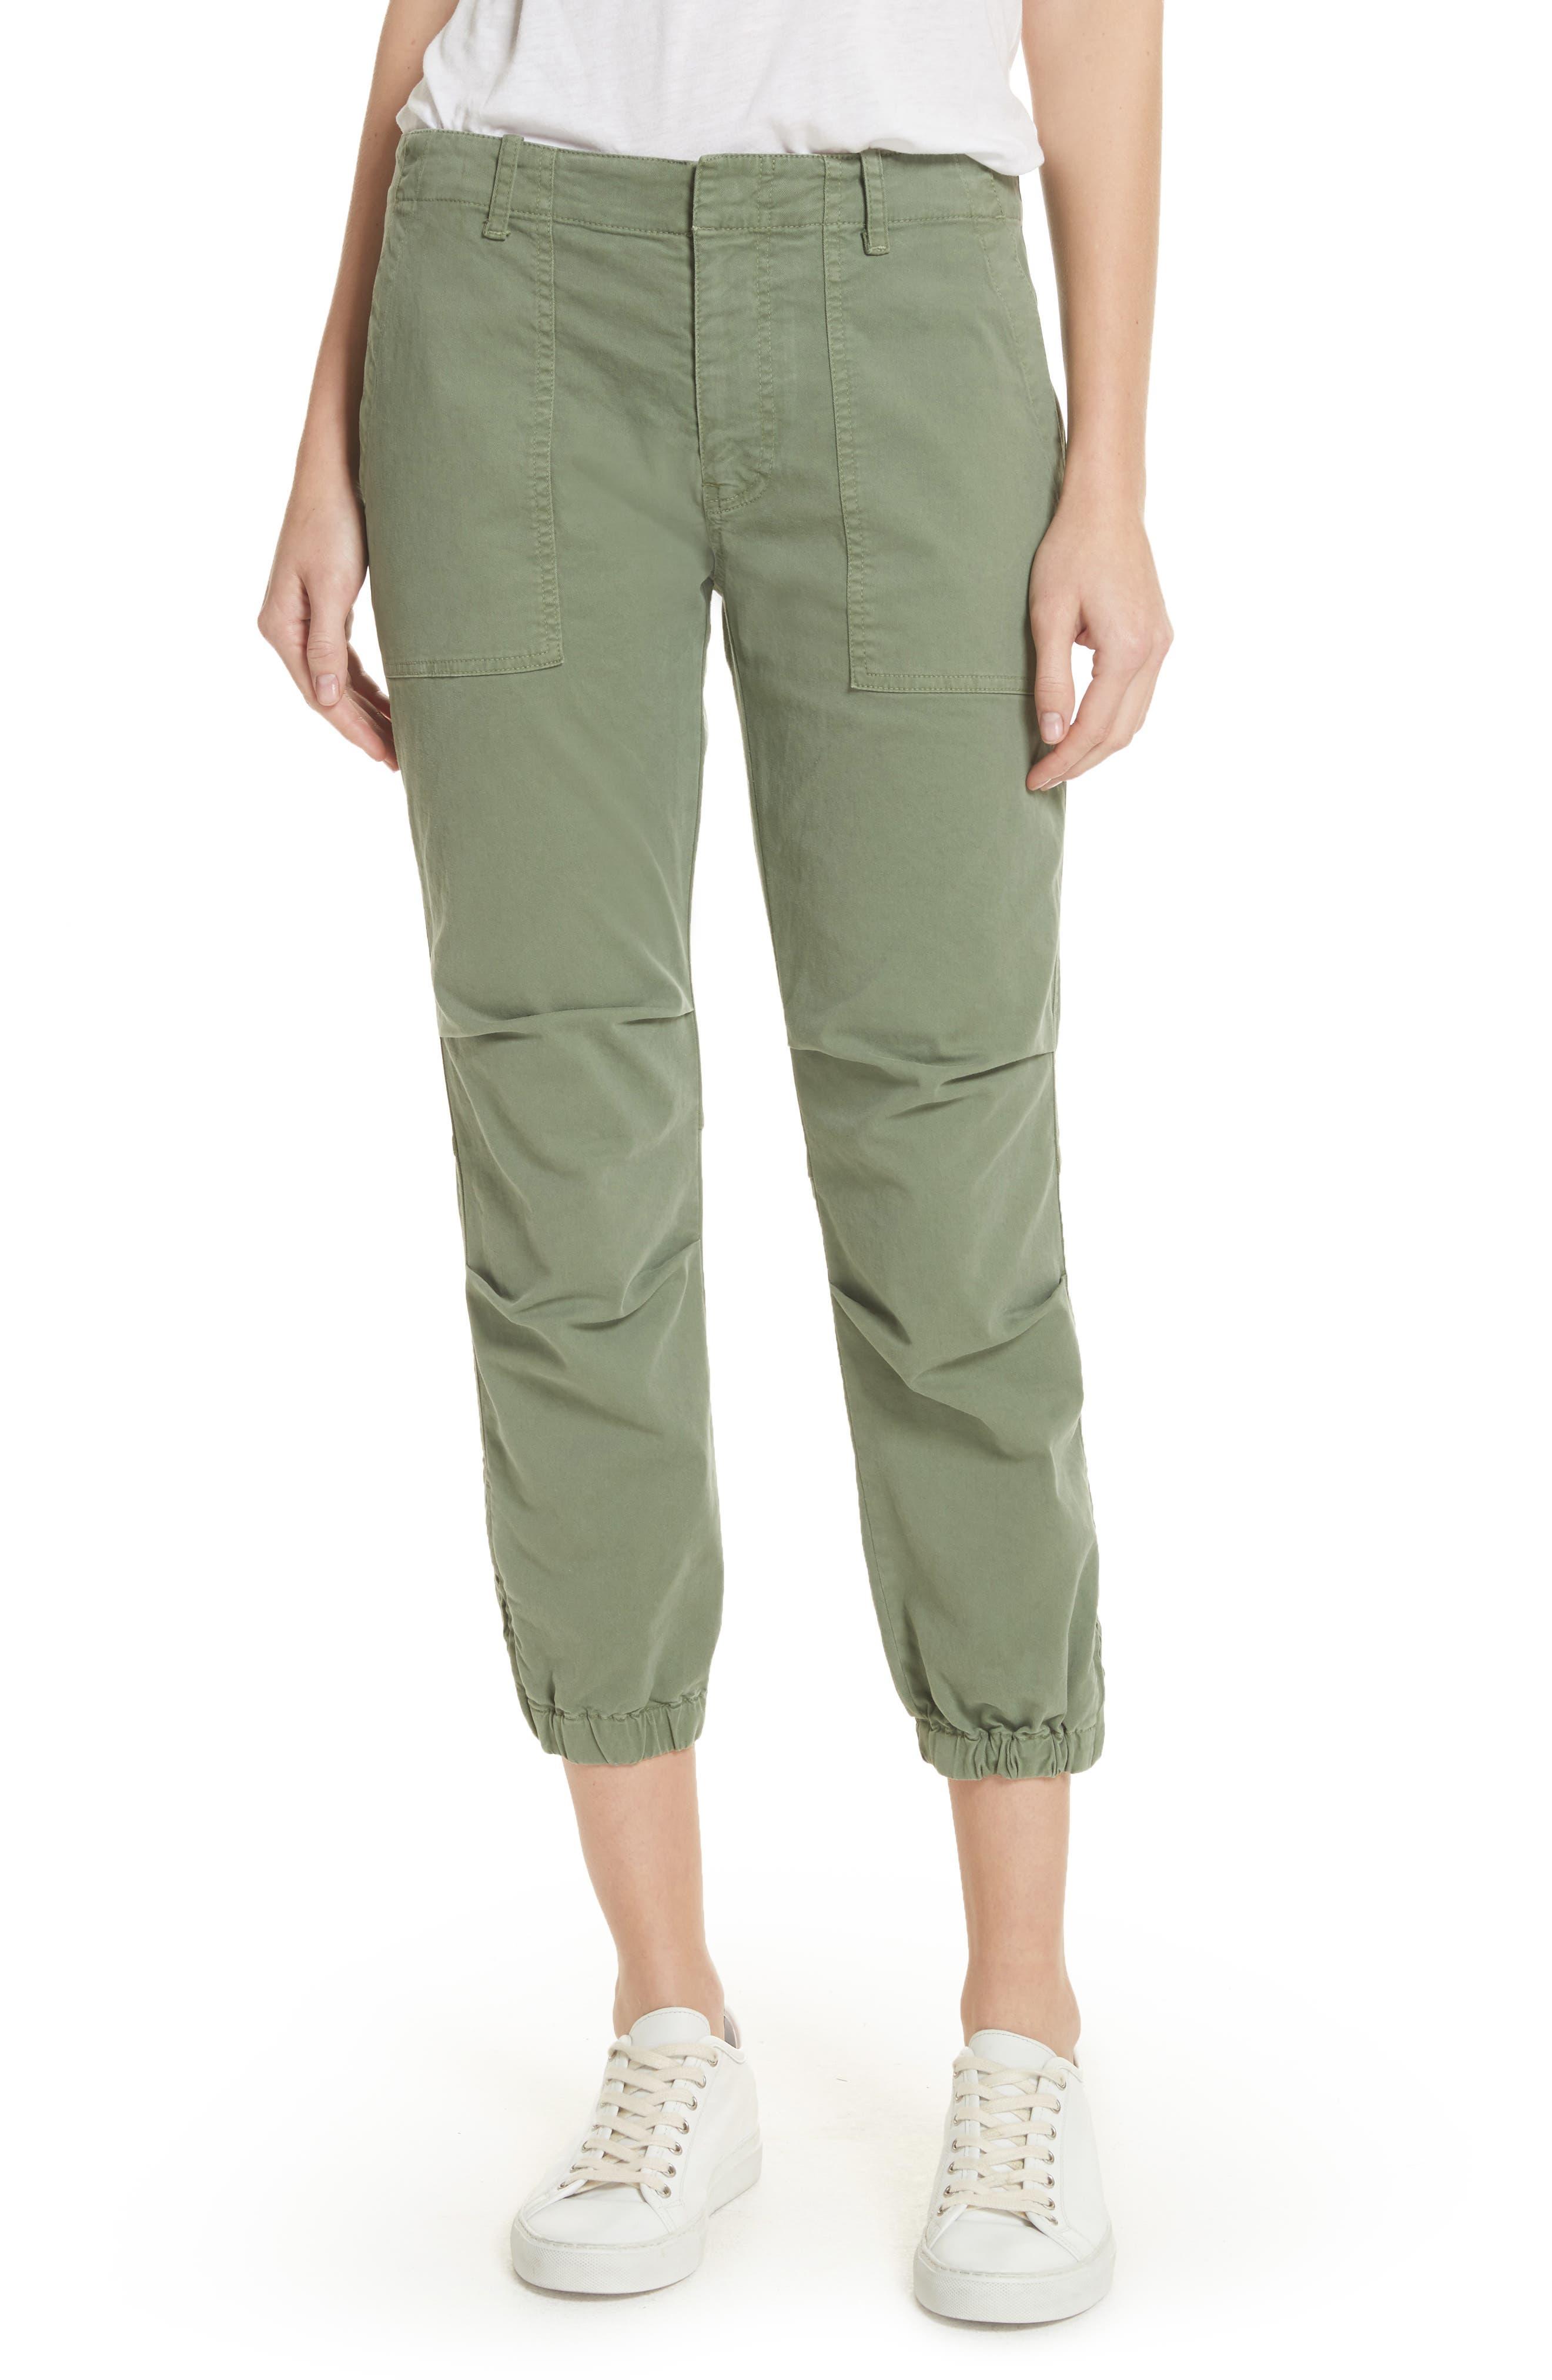 Women's Nili Lotan Stretch Cotton Twill Crop Military Pants,  0 - Green